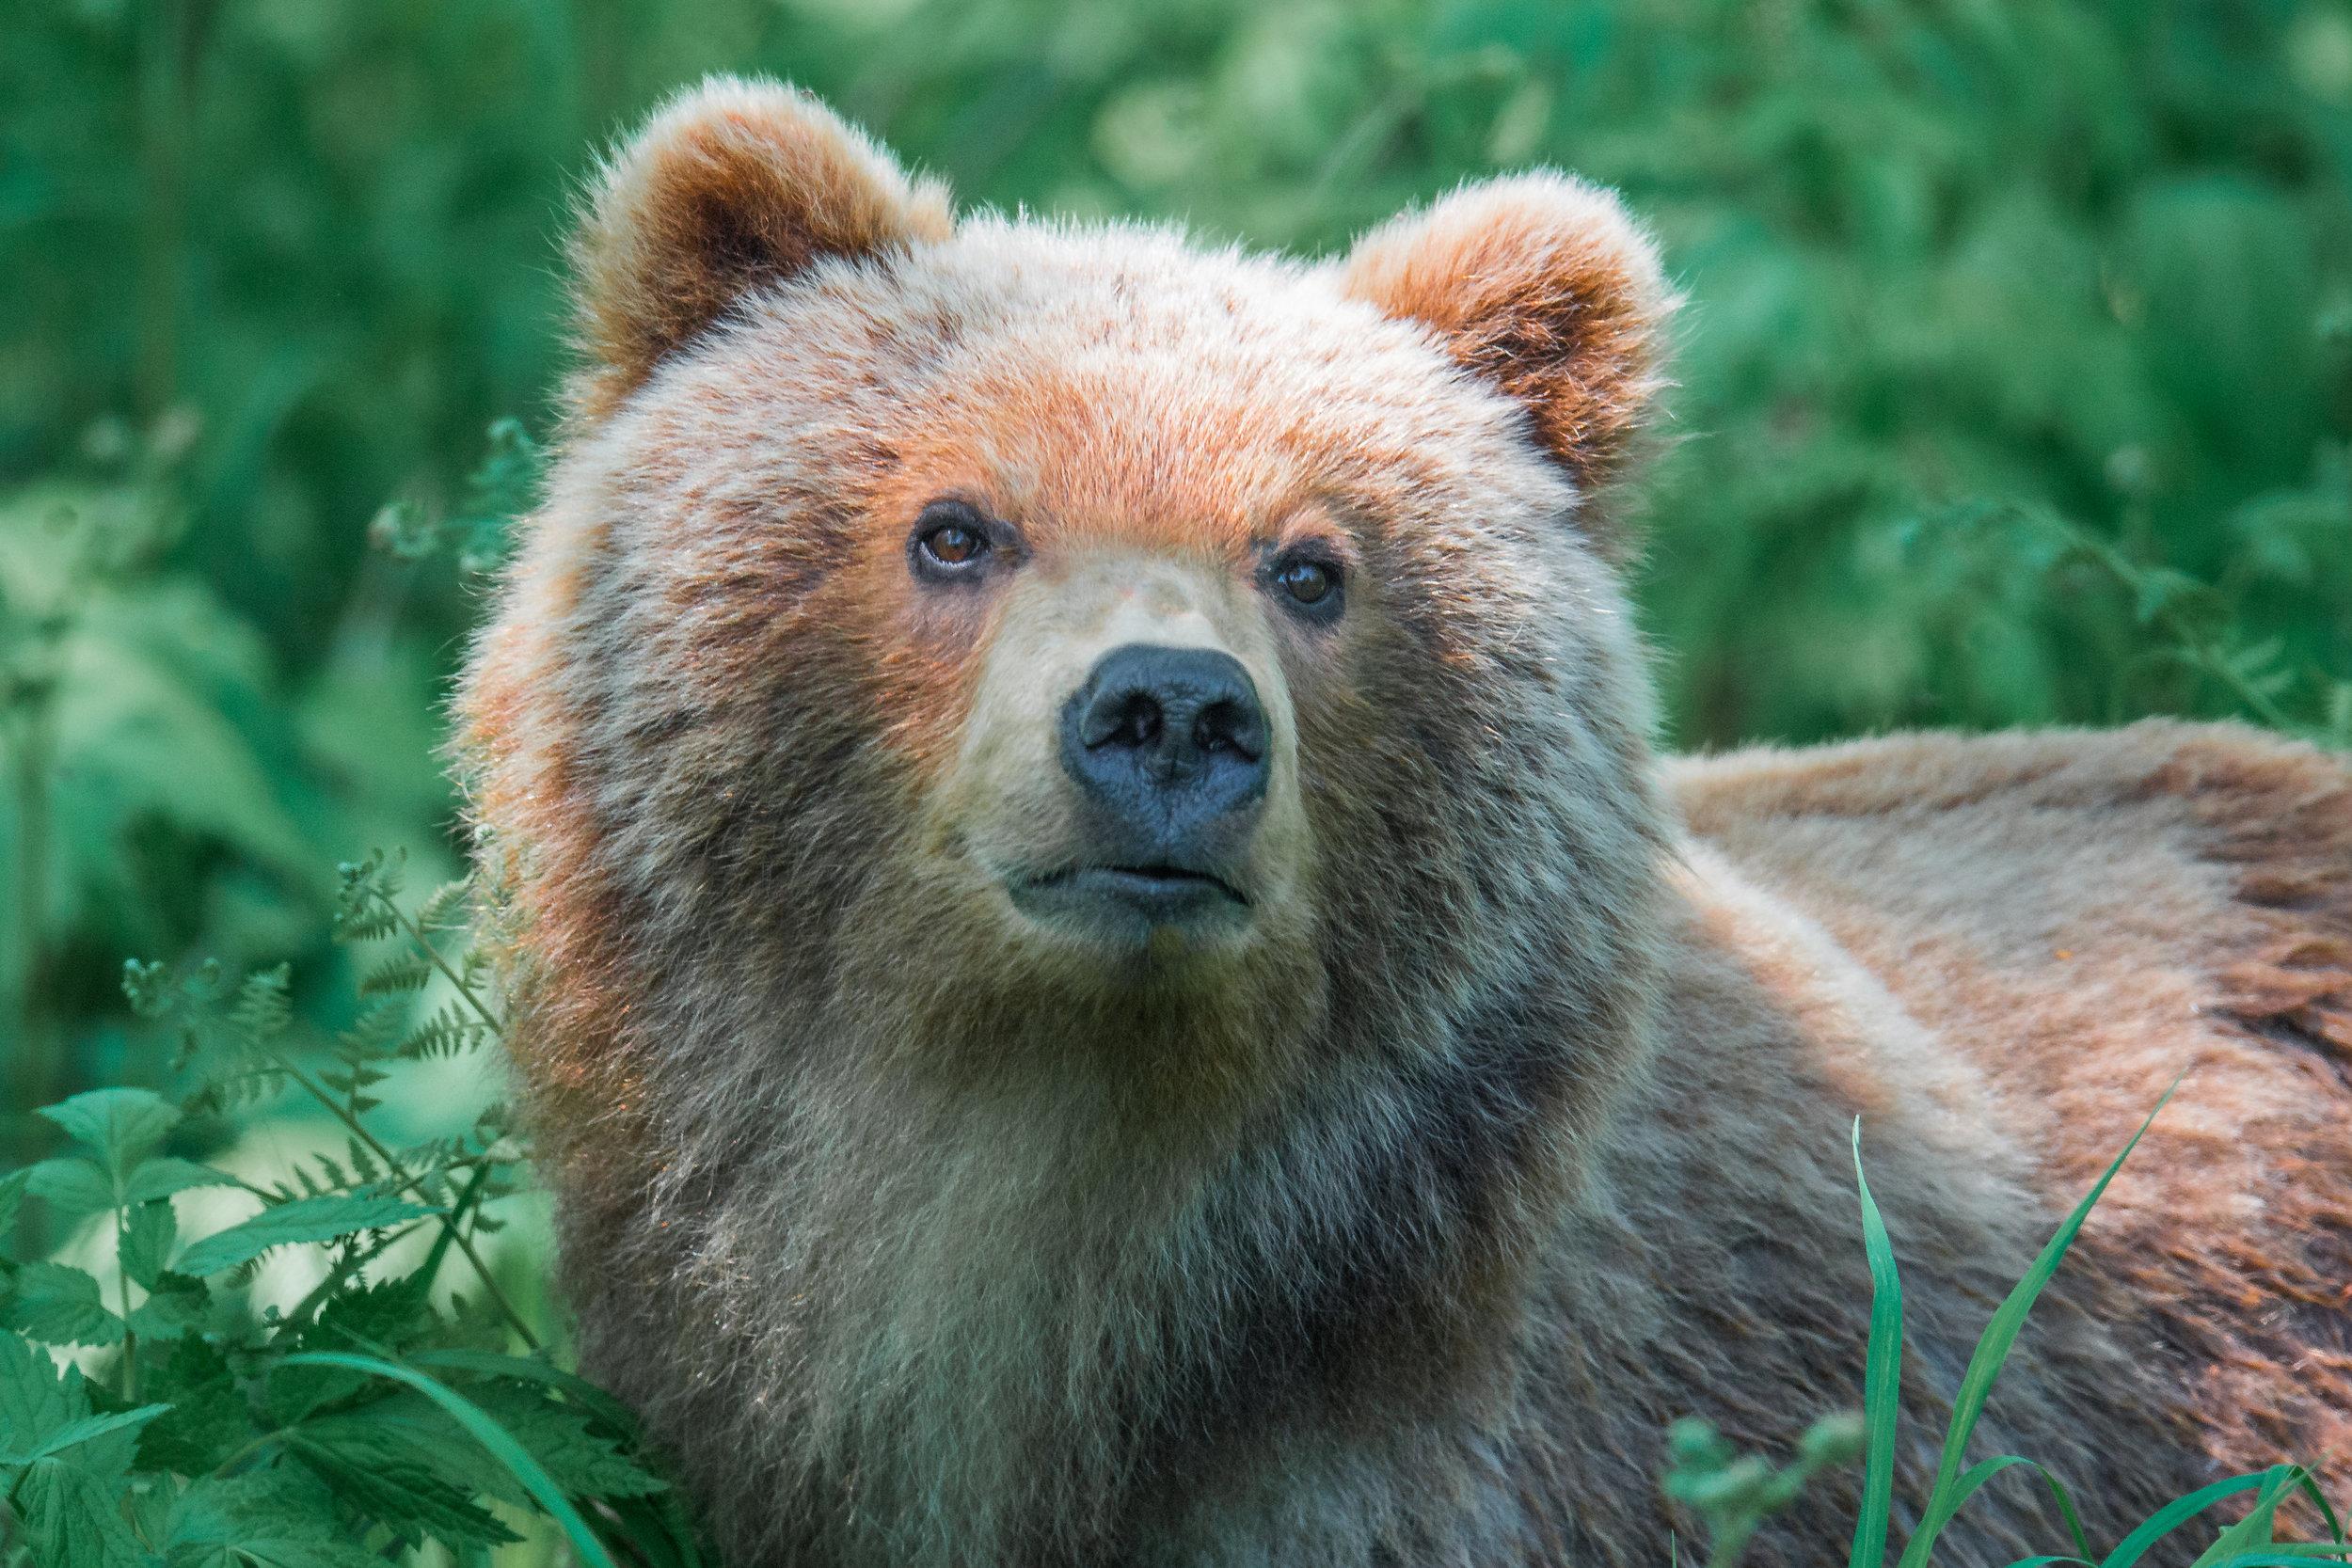 Featured Photo 51: Kamchatka Brown Bear (Ursus arctos beringianus), Vilyuchinskiy Pereval, KAM (RU)  EQ: D7200, 500mm f/4.0  Taken: 6-26-2017 at 14:23   Settings: 750mm (35mm eqiv), 1/800s, f/4.0, ISO640, 1/3EV  Conditions: Shaddy